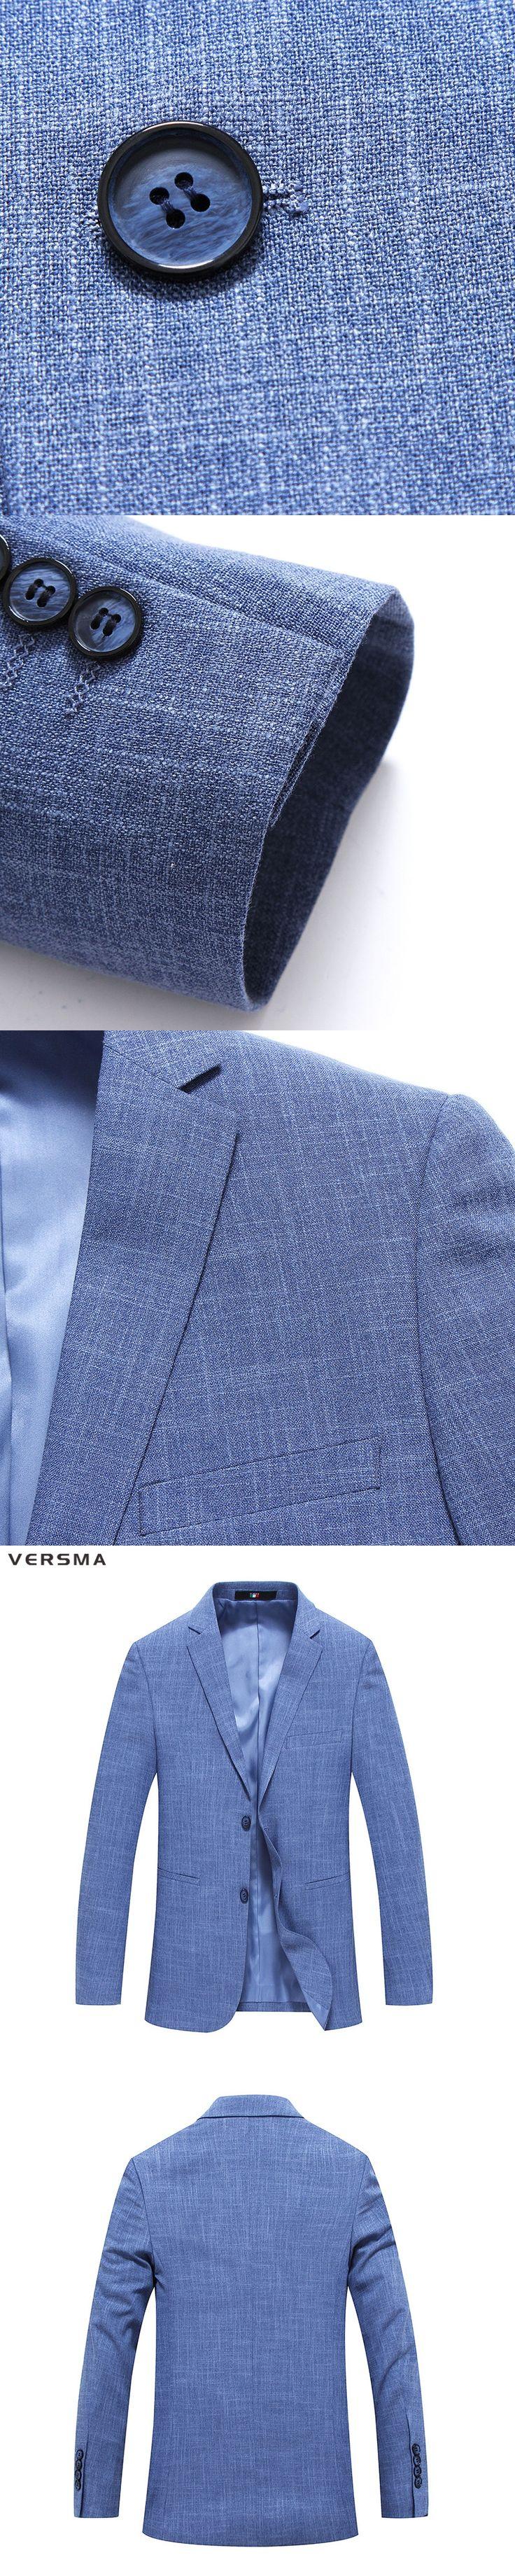 VERSMA 2017 New Mens Suit Blazer Masculino Stripe Mens Suit Jacket Sky Blue Men Blazer Designs Men Casual Blazer Jacket for Men